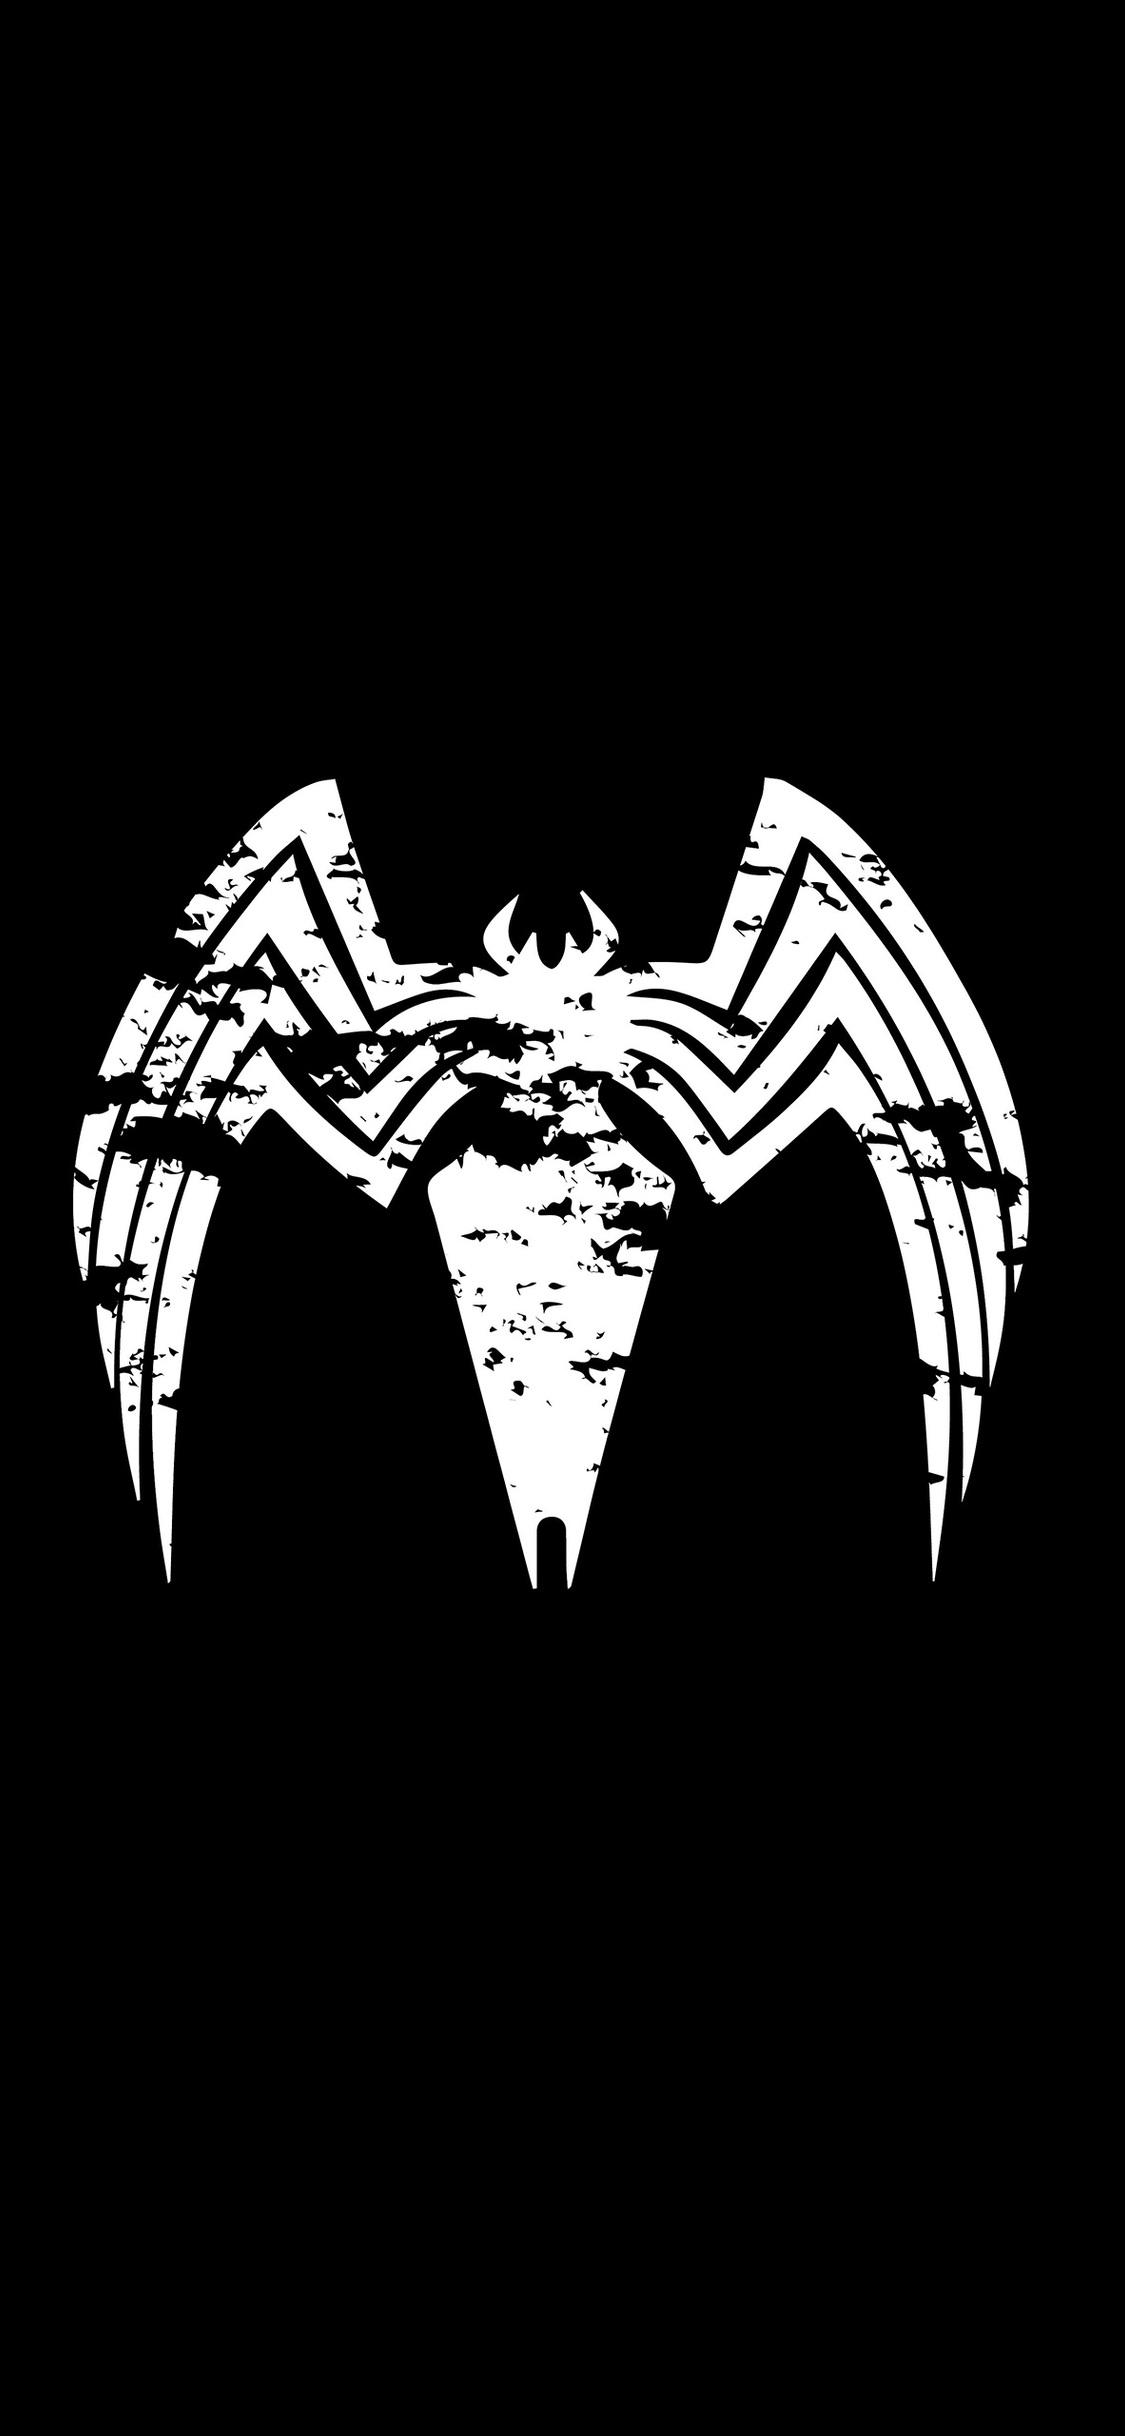 1125x2436 Venom Logo 4k Iphone Xs Iphone 10 Iphone X Hd 4k